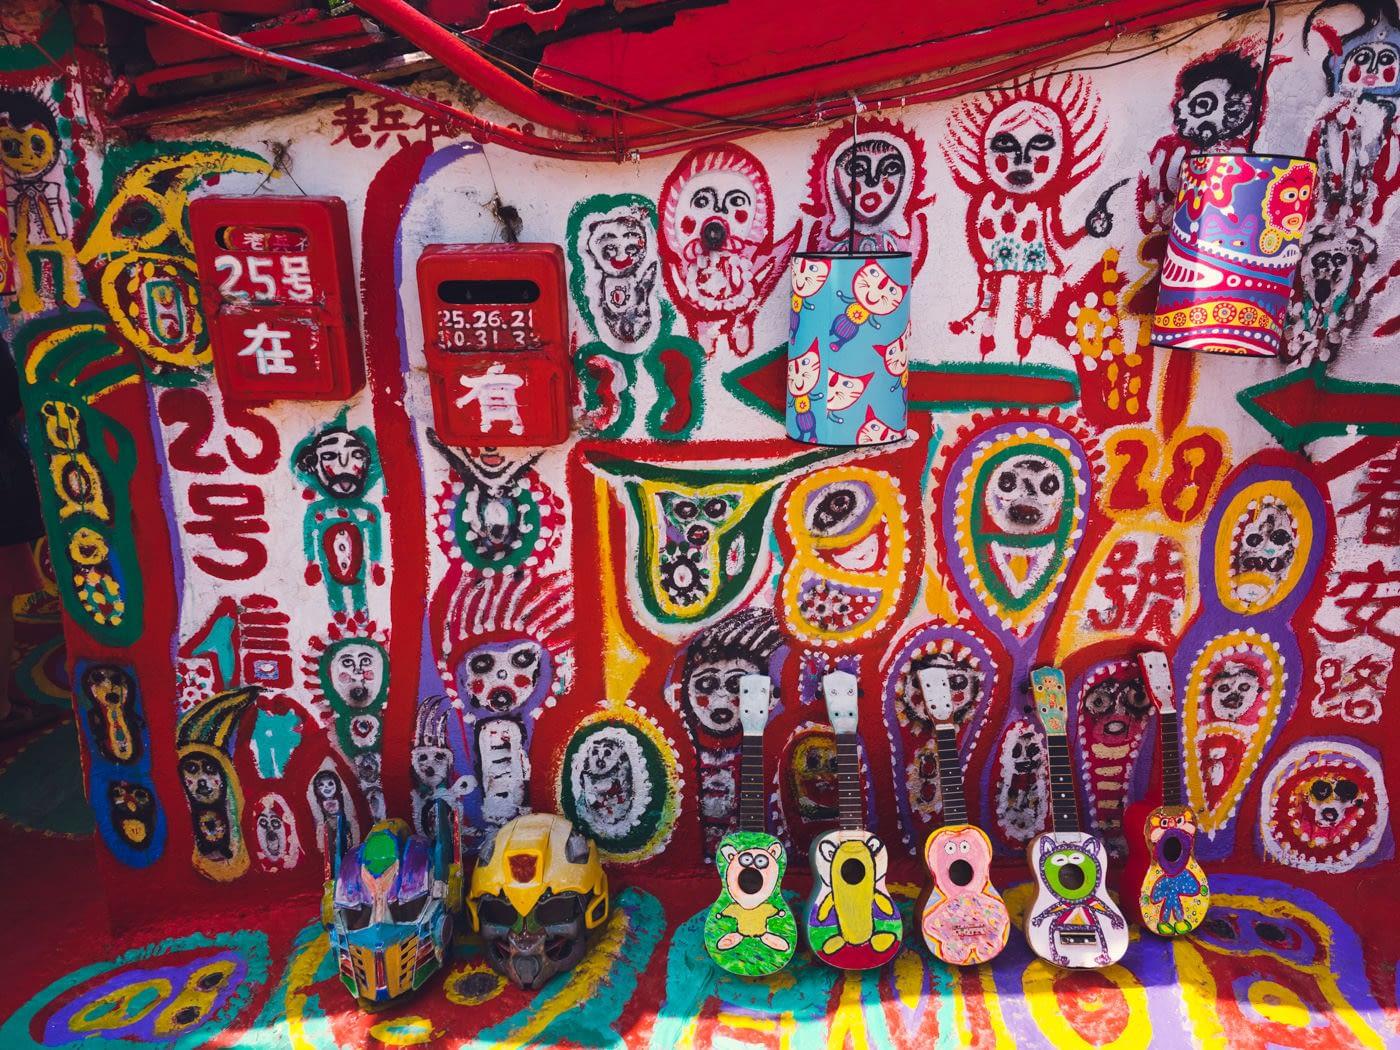 Taiwan - Rainbow Village - Hand painted ukuleles